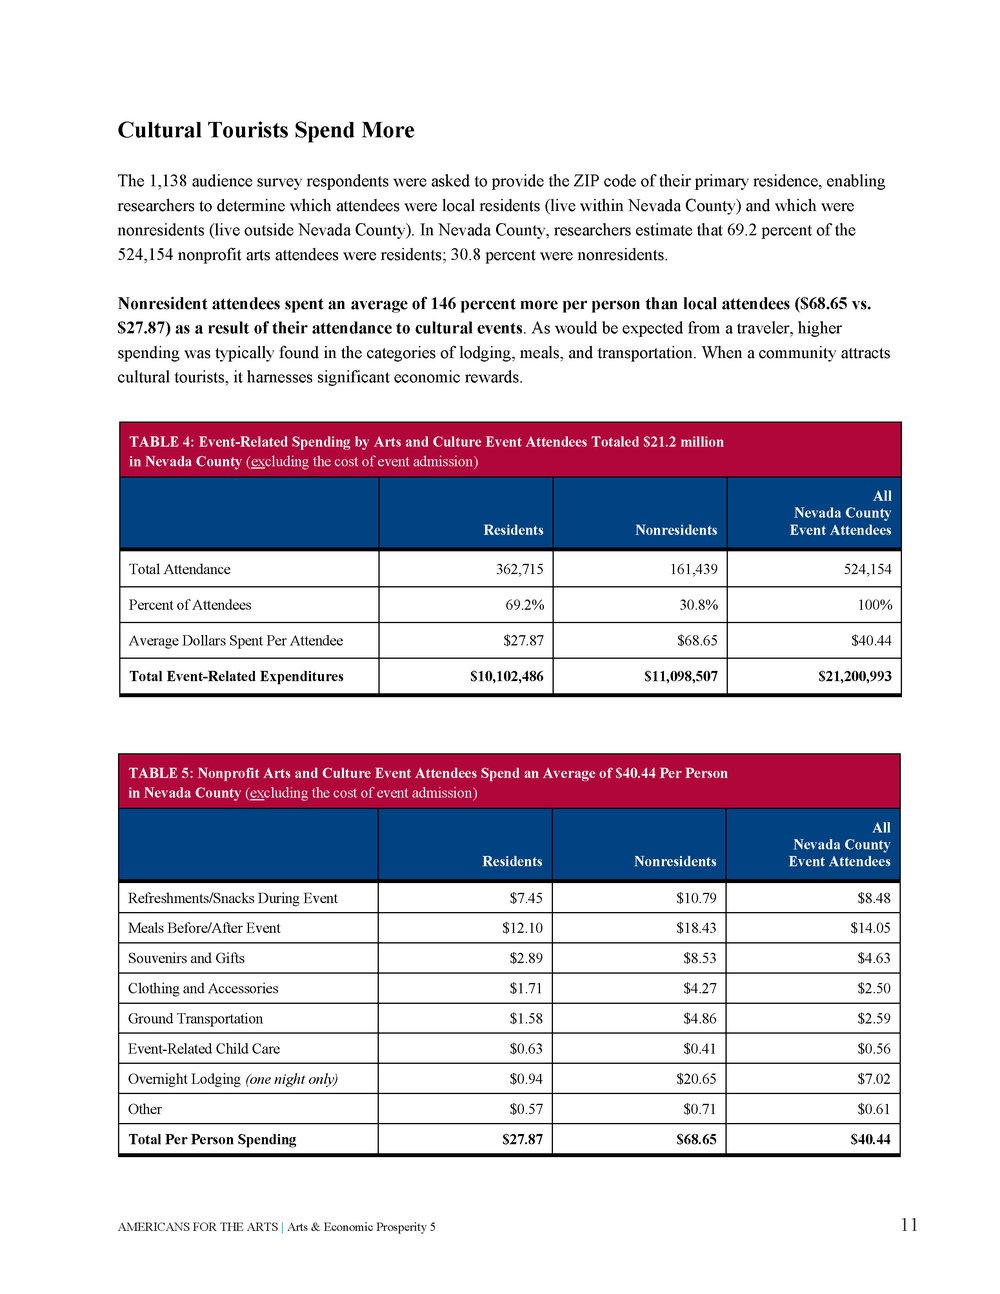 Arts & Economic Prosperity in Nevada County_Page_15.jpg